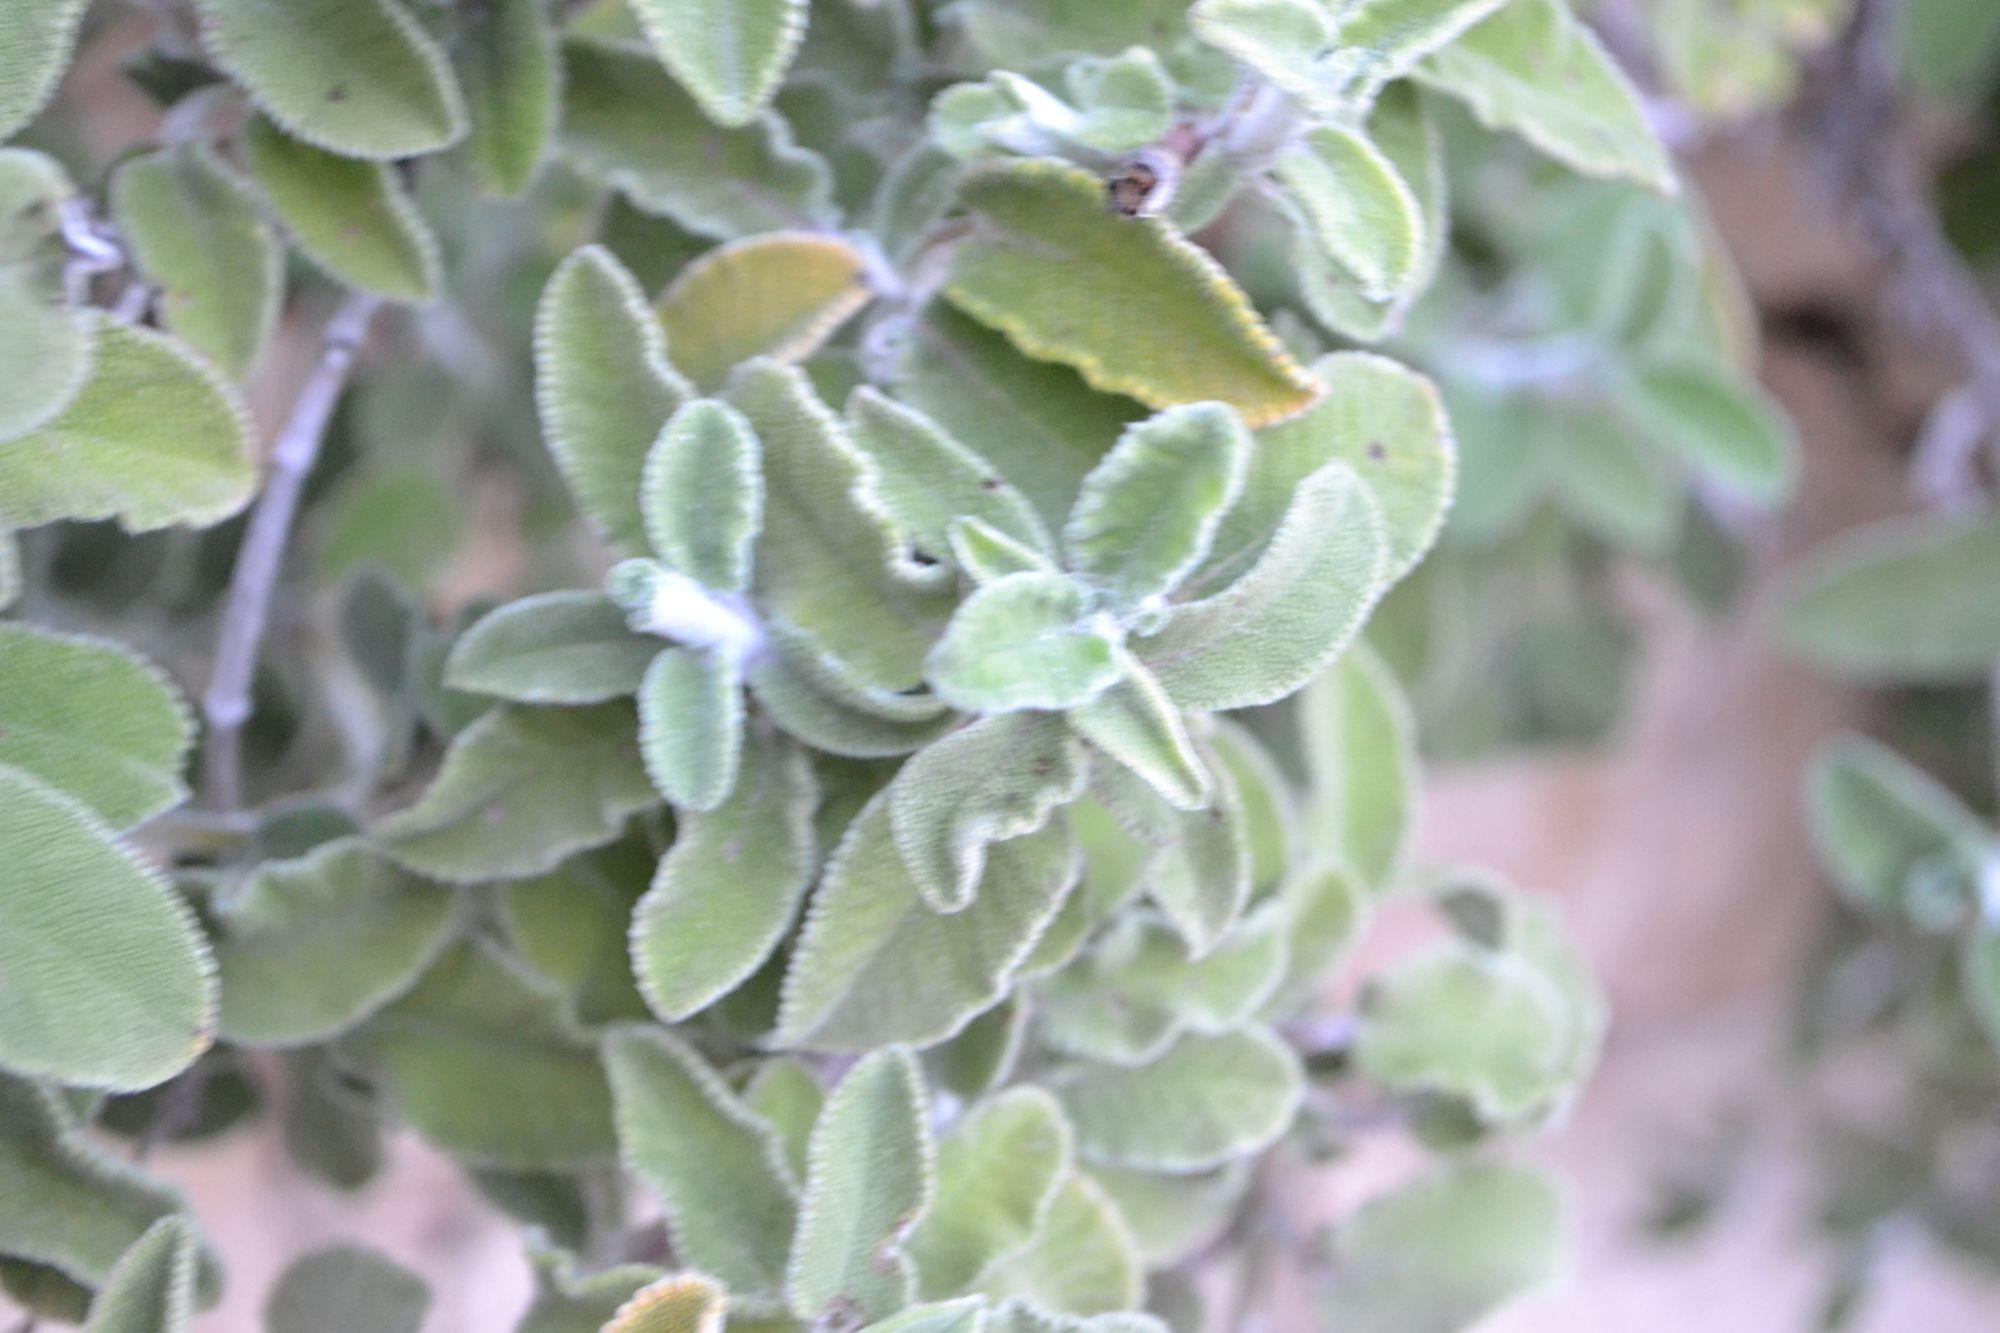 Krūminis šalavijas (Salvia fruticosa)